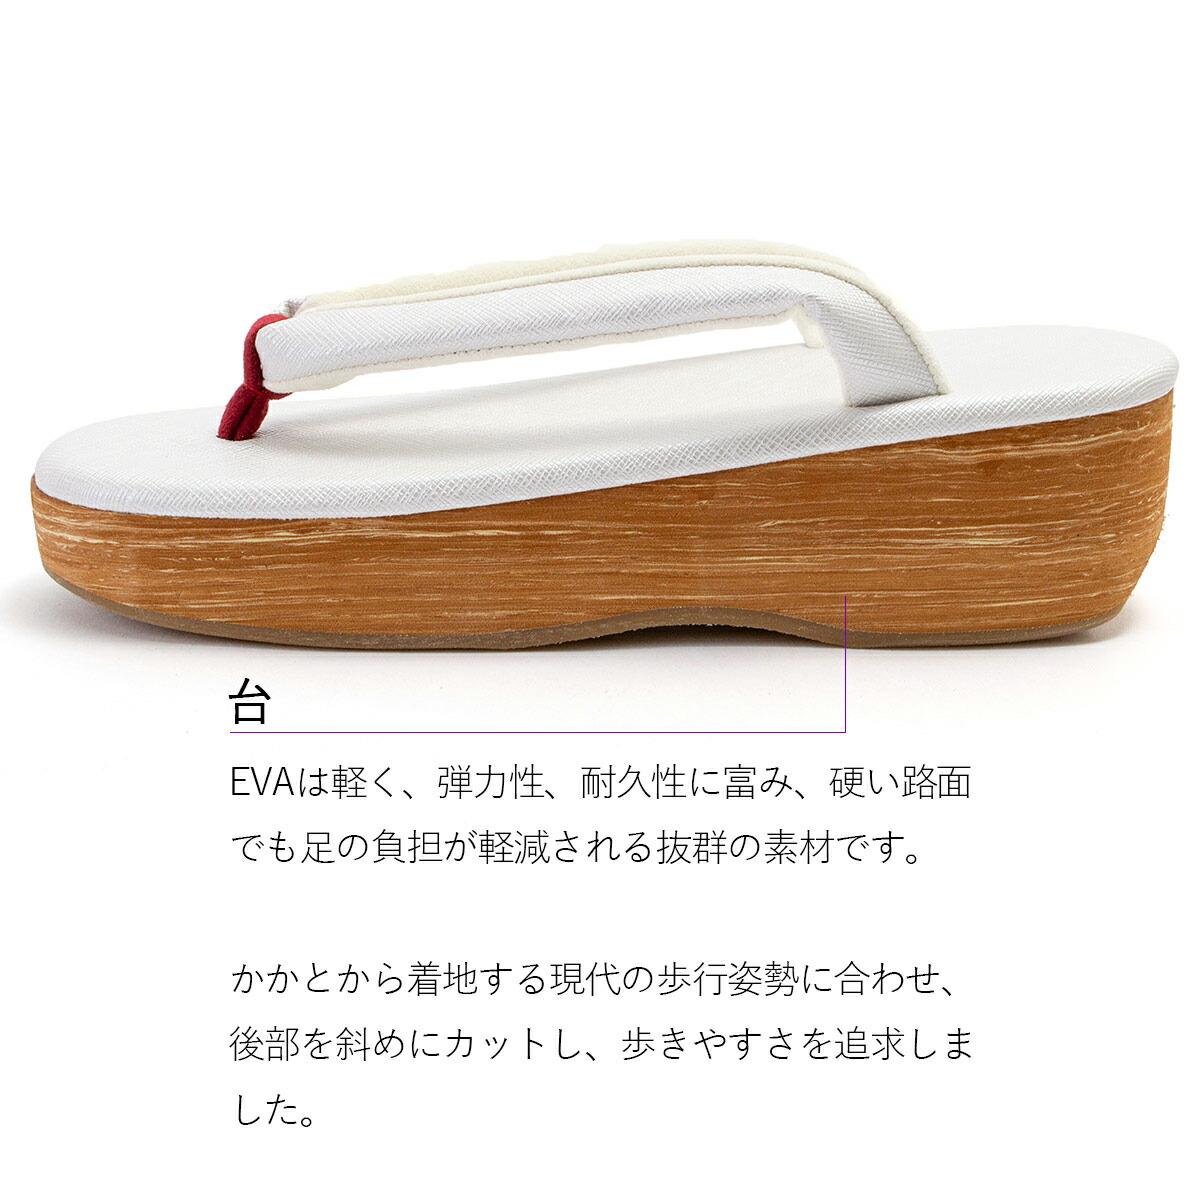 . HAKU 草履NO.104 |ホワイト /> <br><br> <img src=